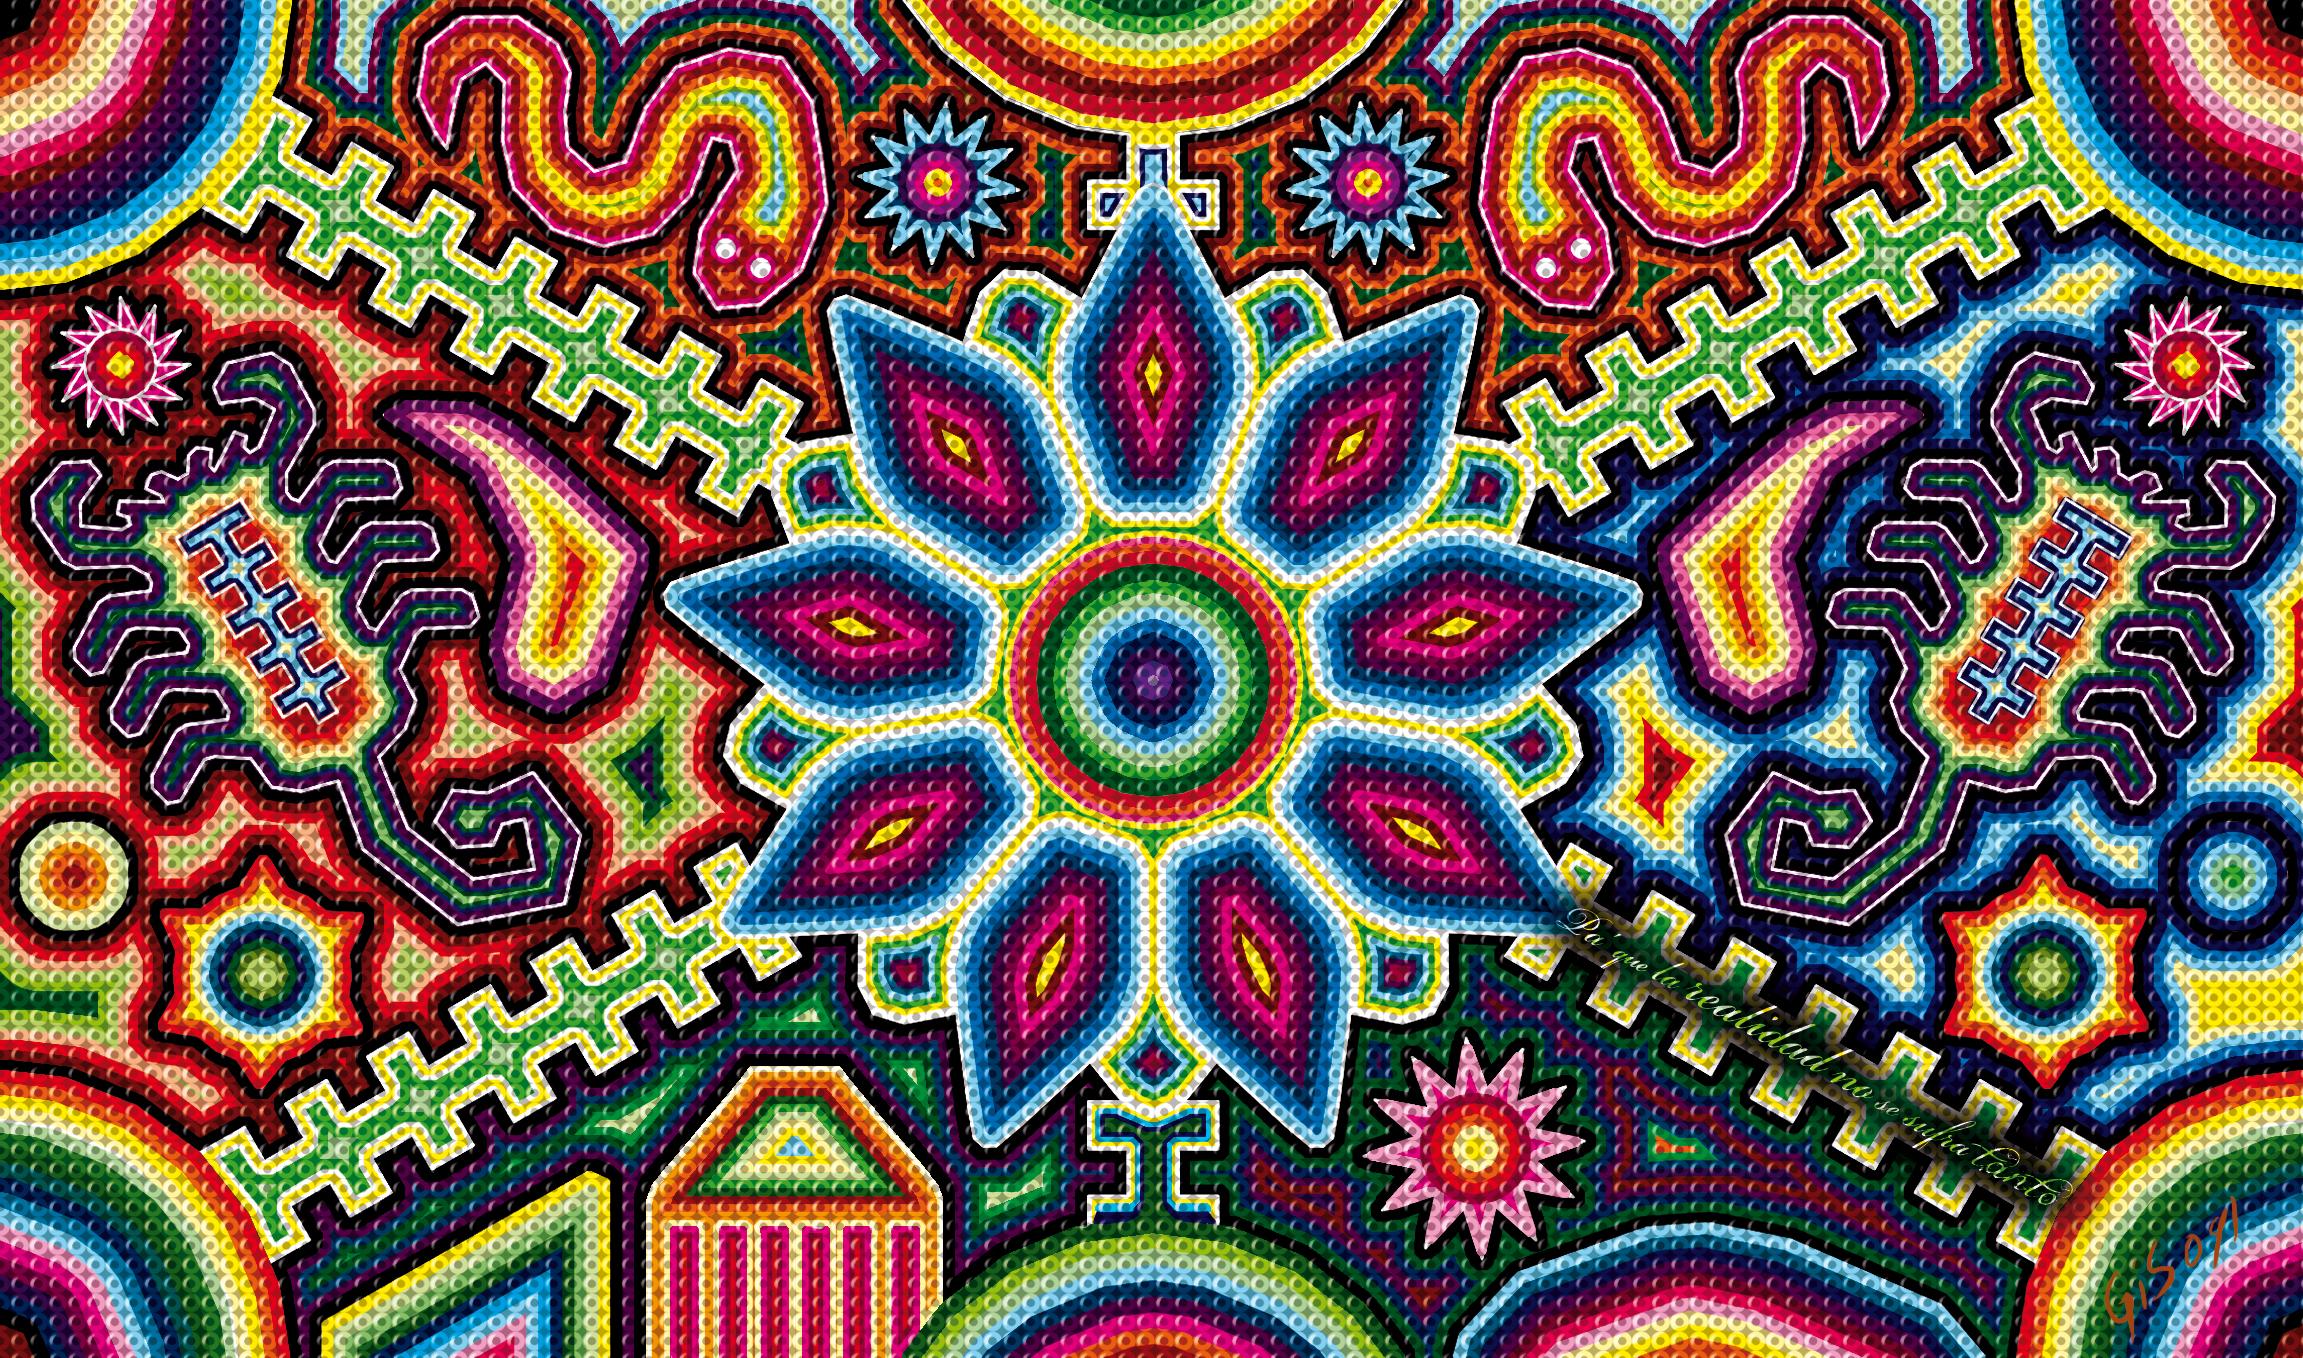 Best 39 Huichol Wallpaper on HipWallpaper Huichol Wallpaper 2303x1358